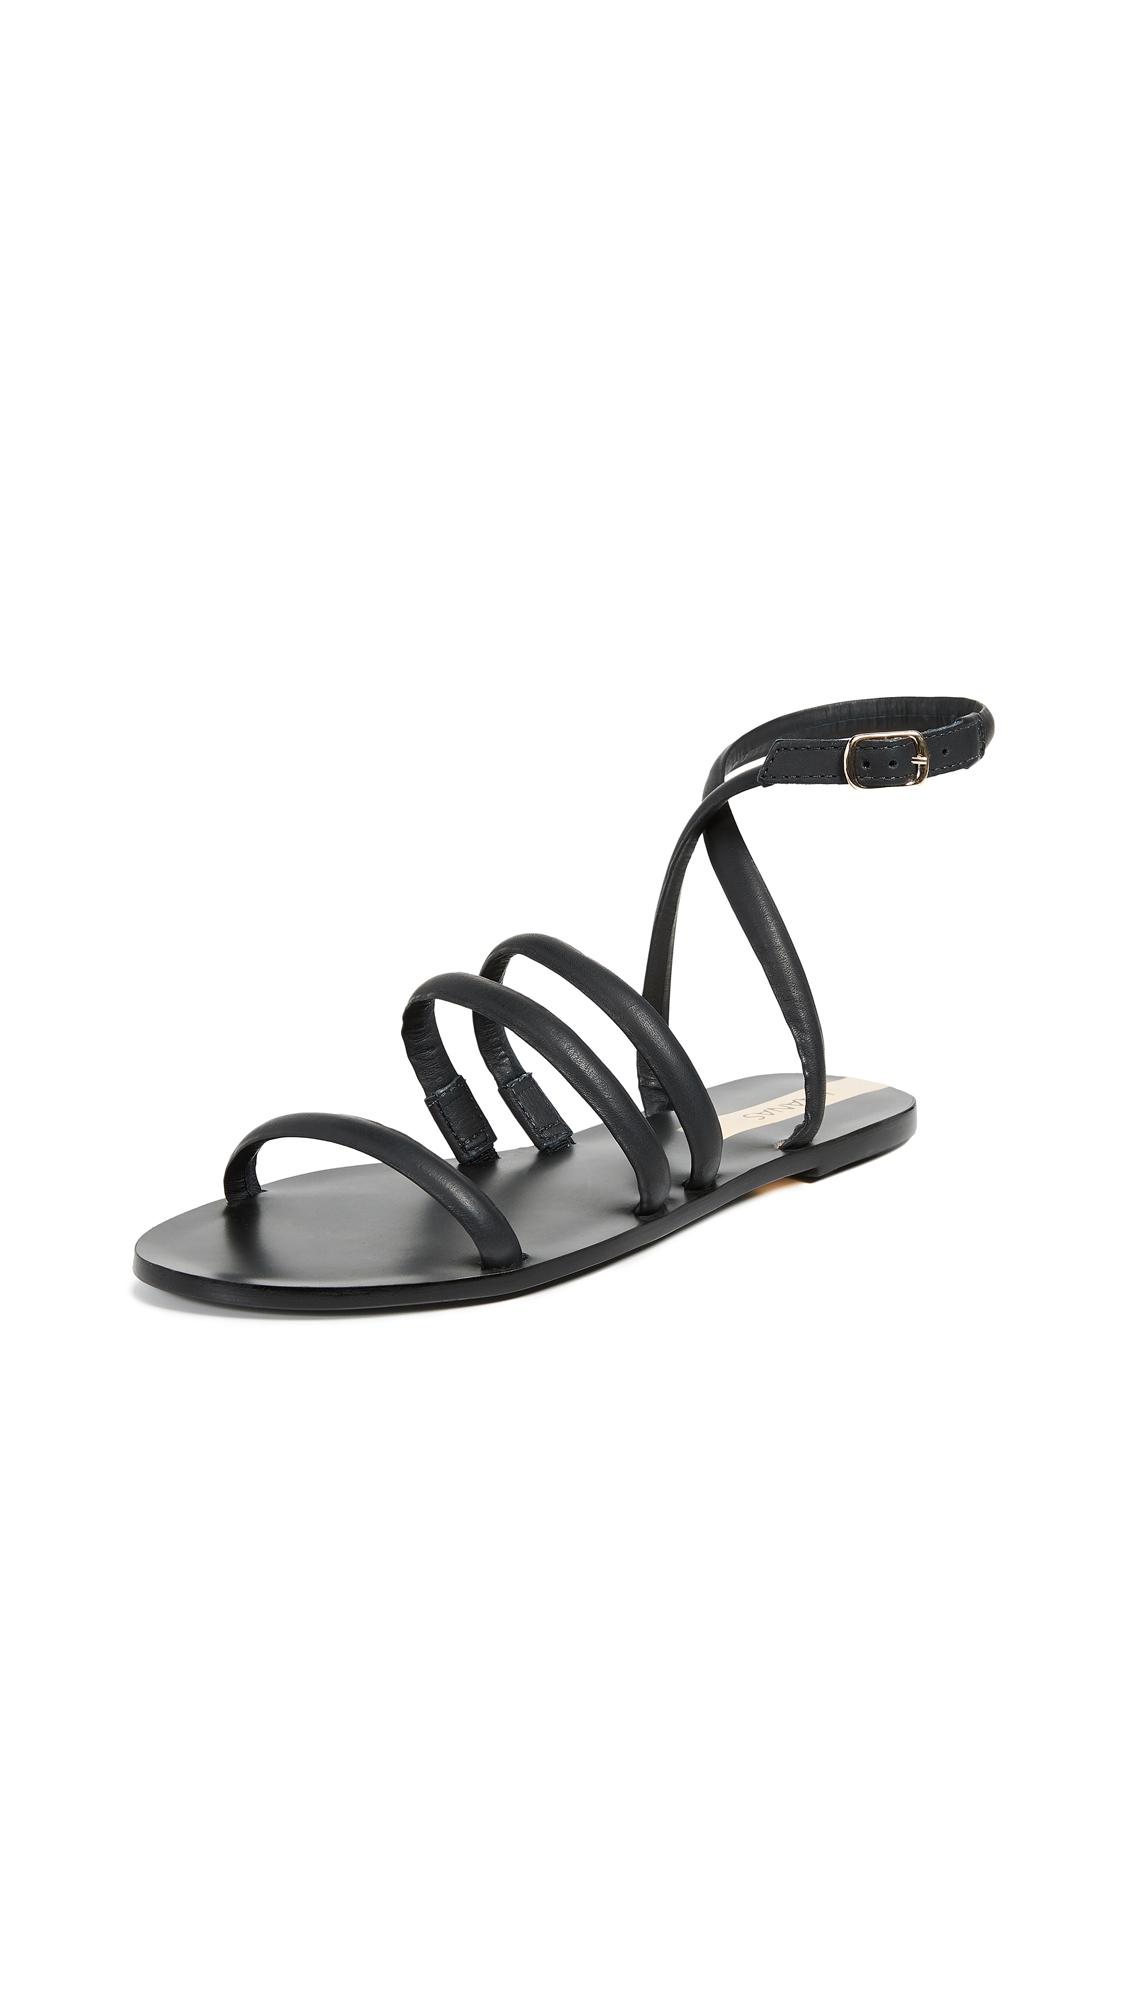 KAANAS Diamantina Strappy Sandals - Black